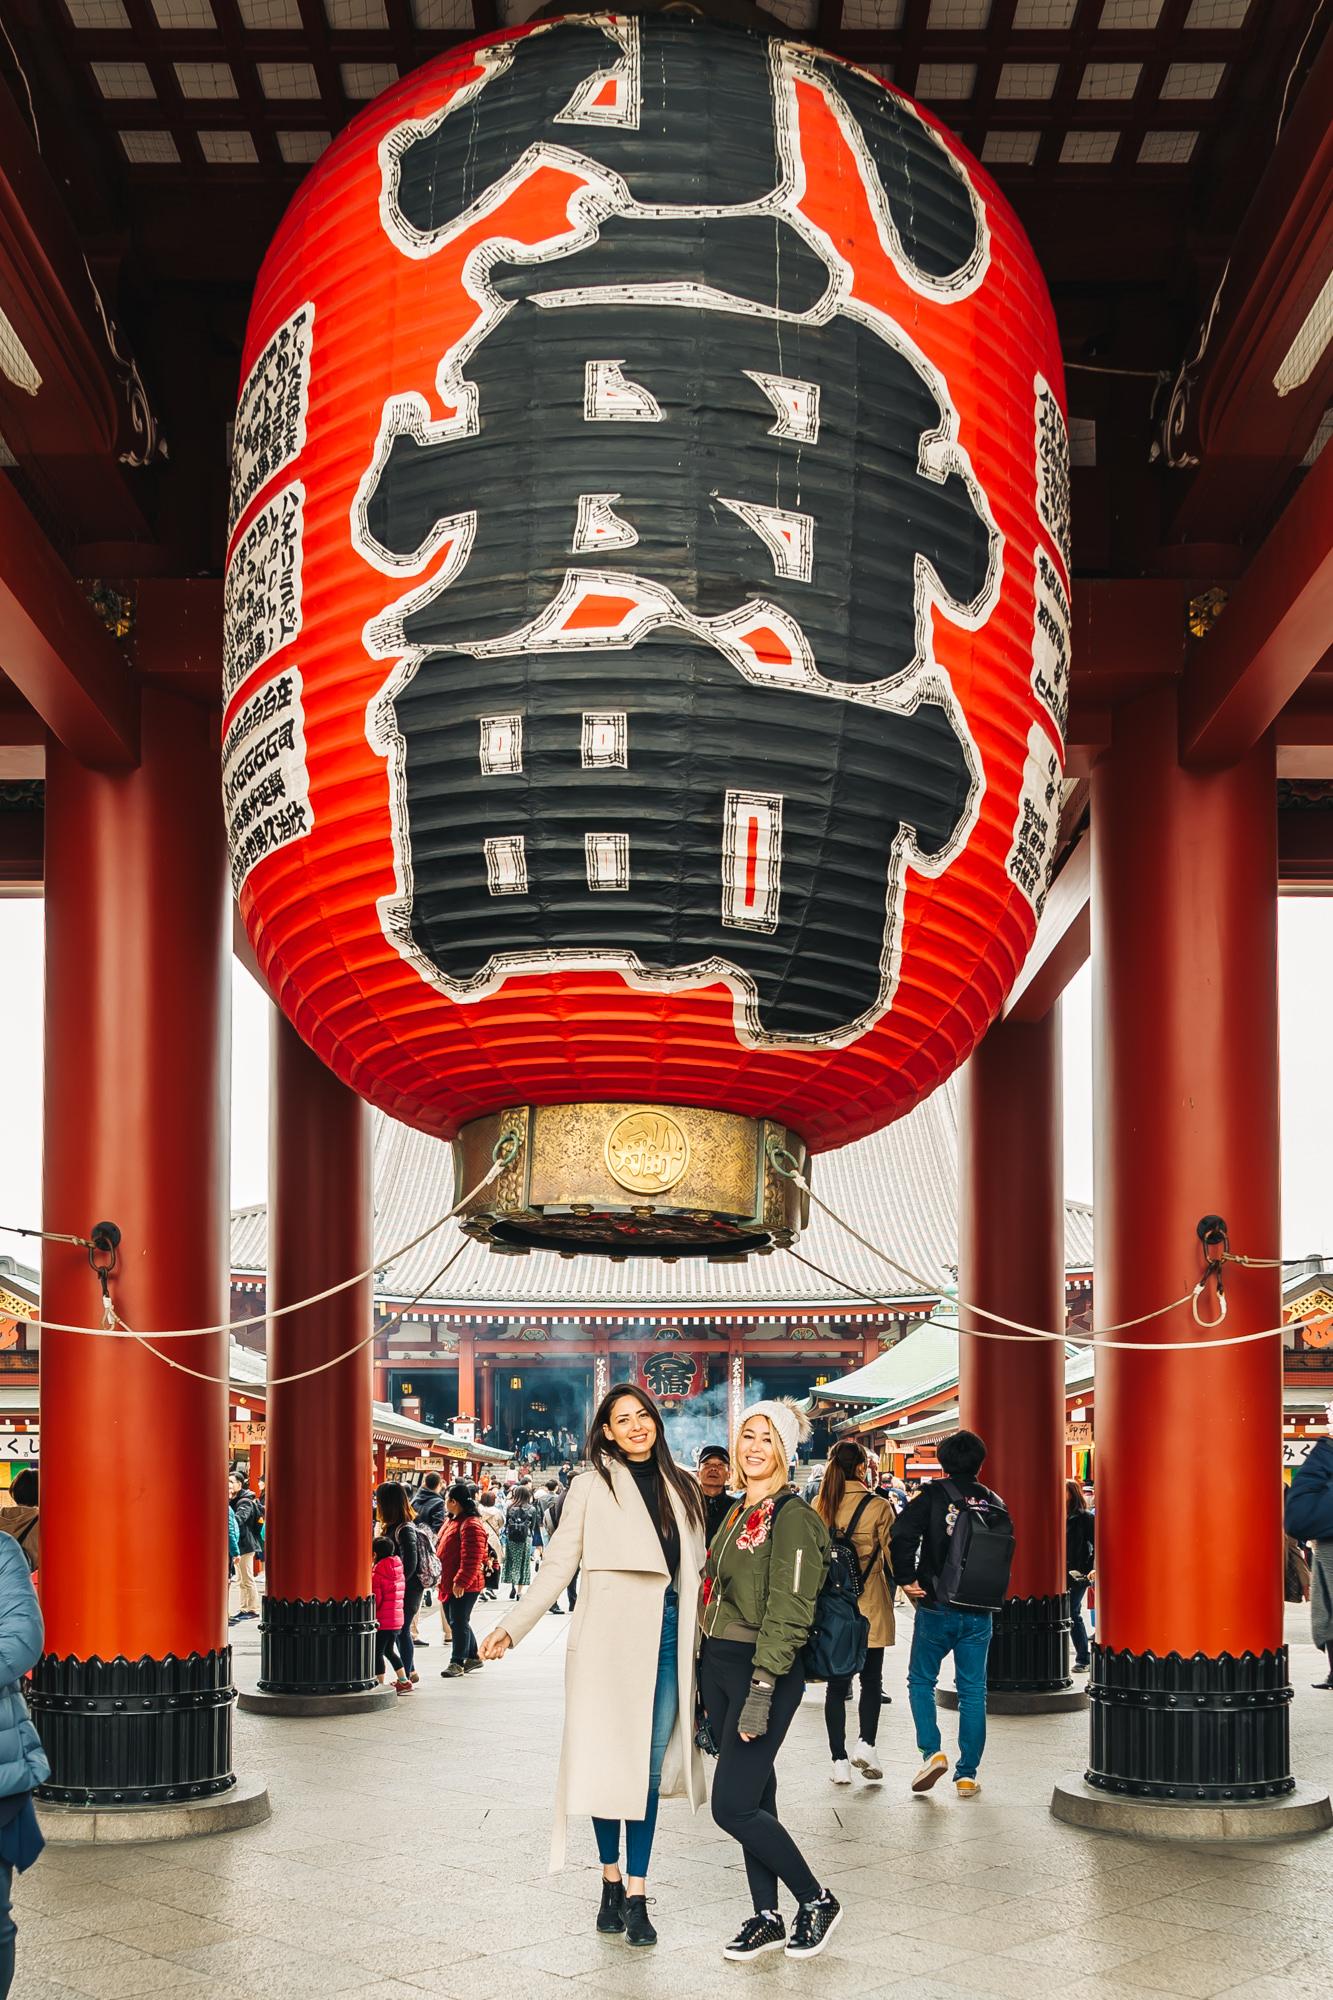 The second gate at Sensoji Temple